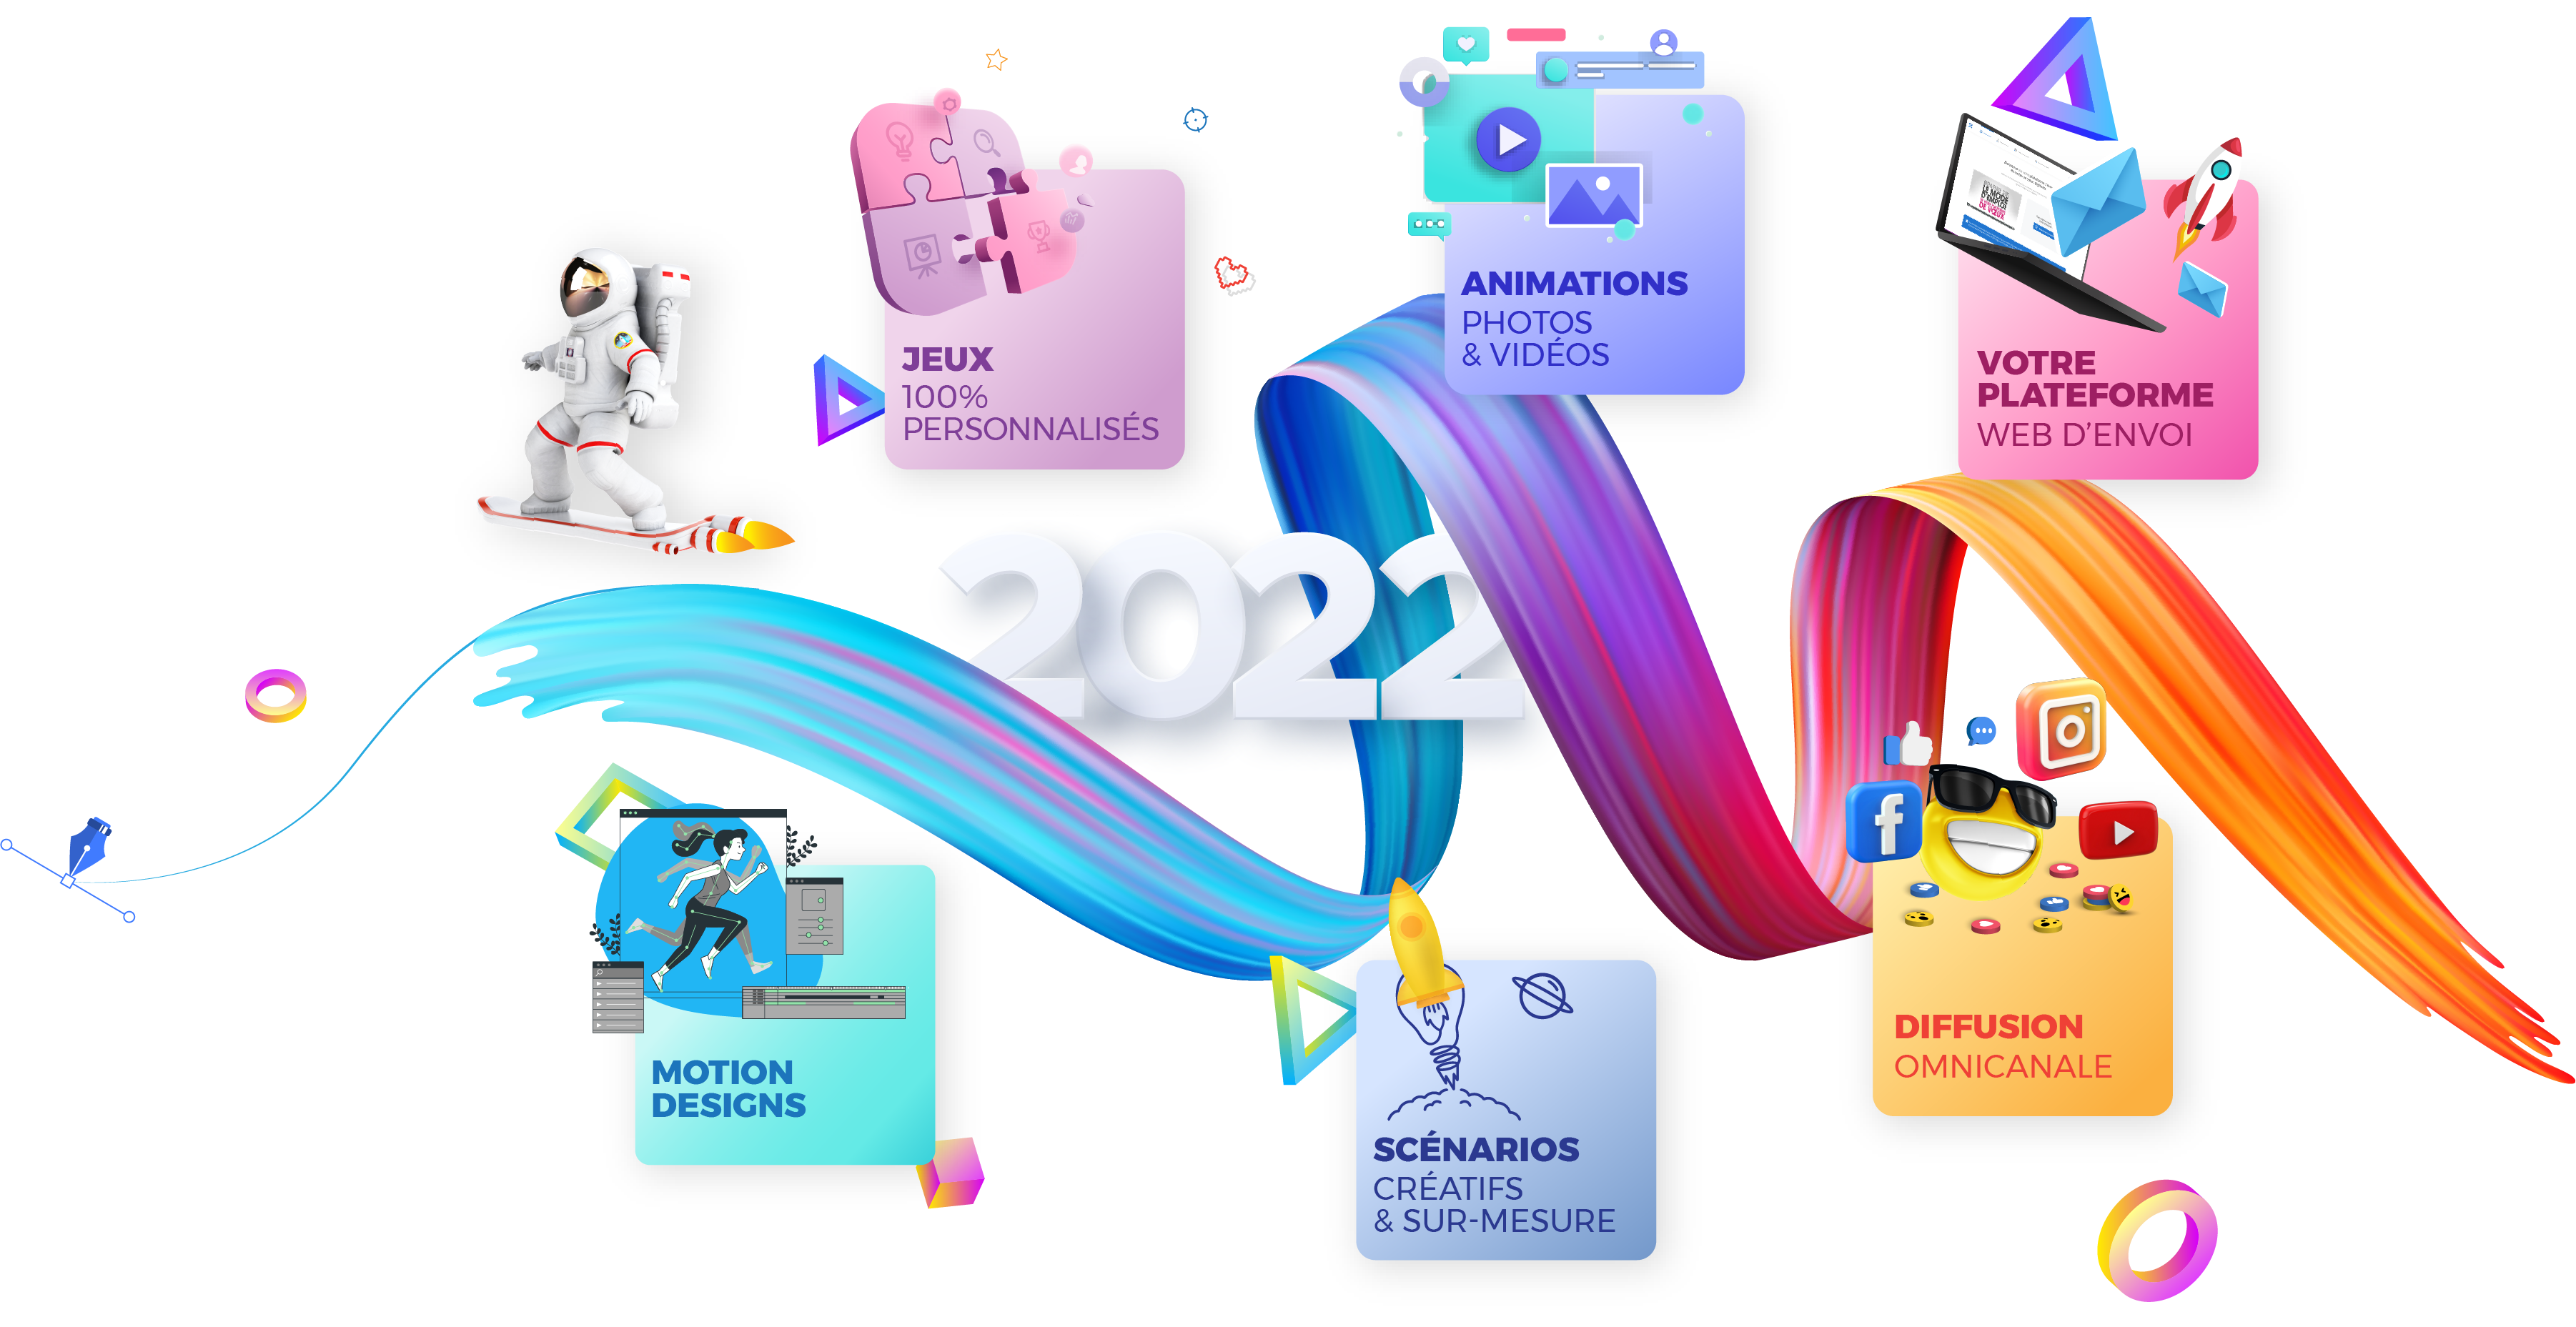 Offre carte de vœux digitale 2022